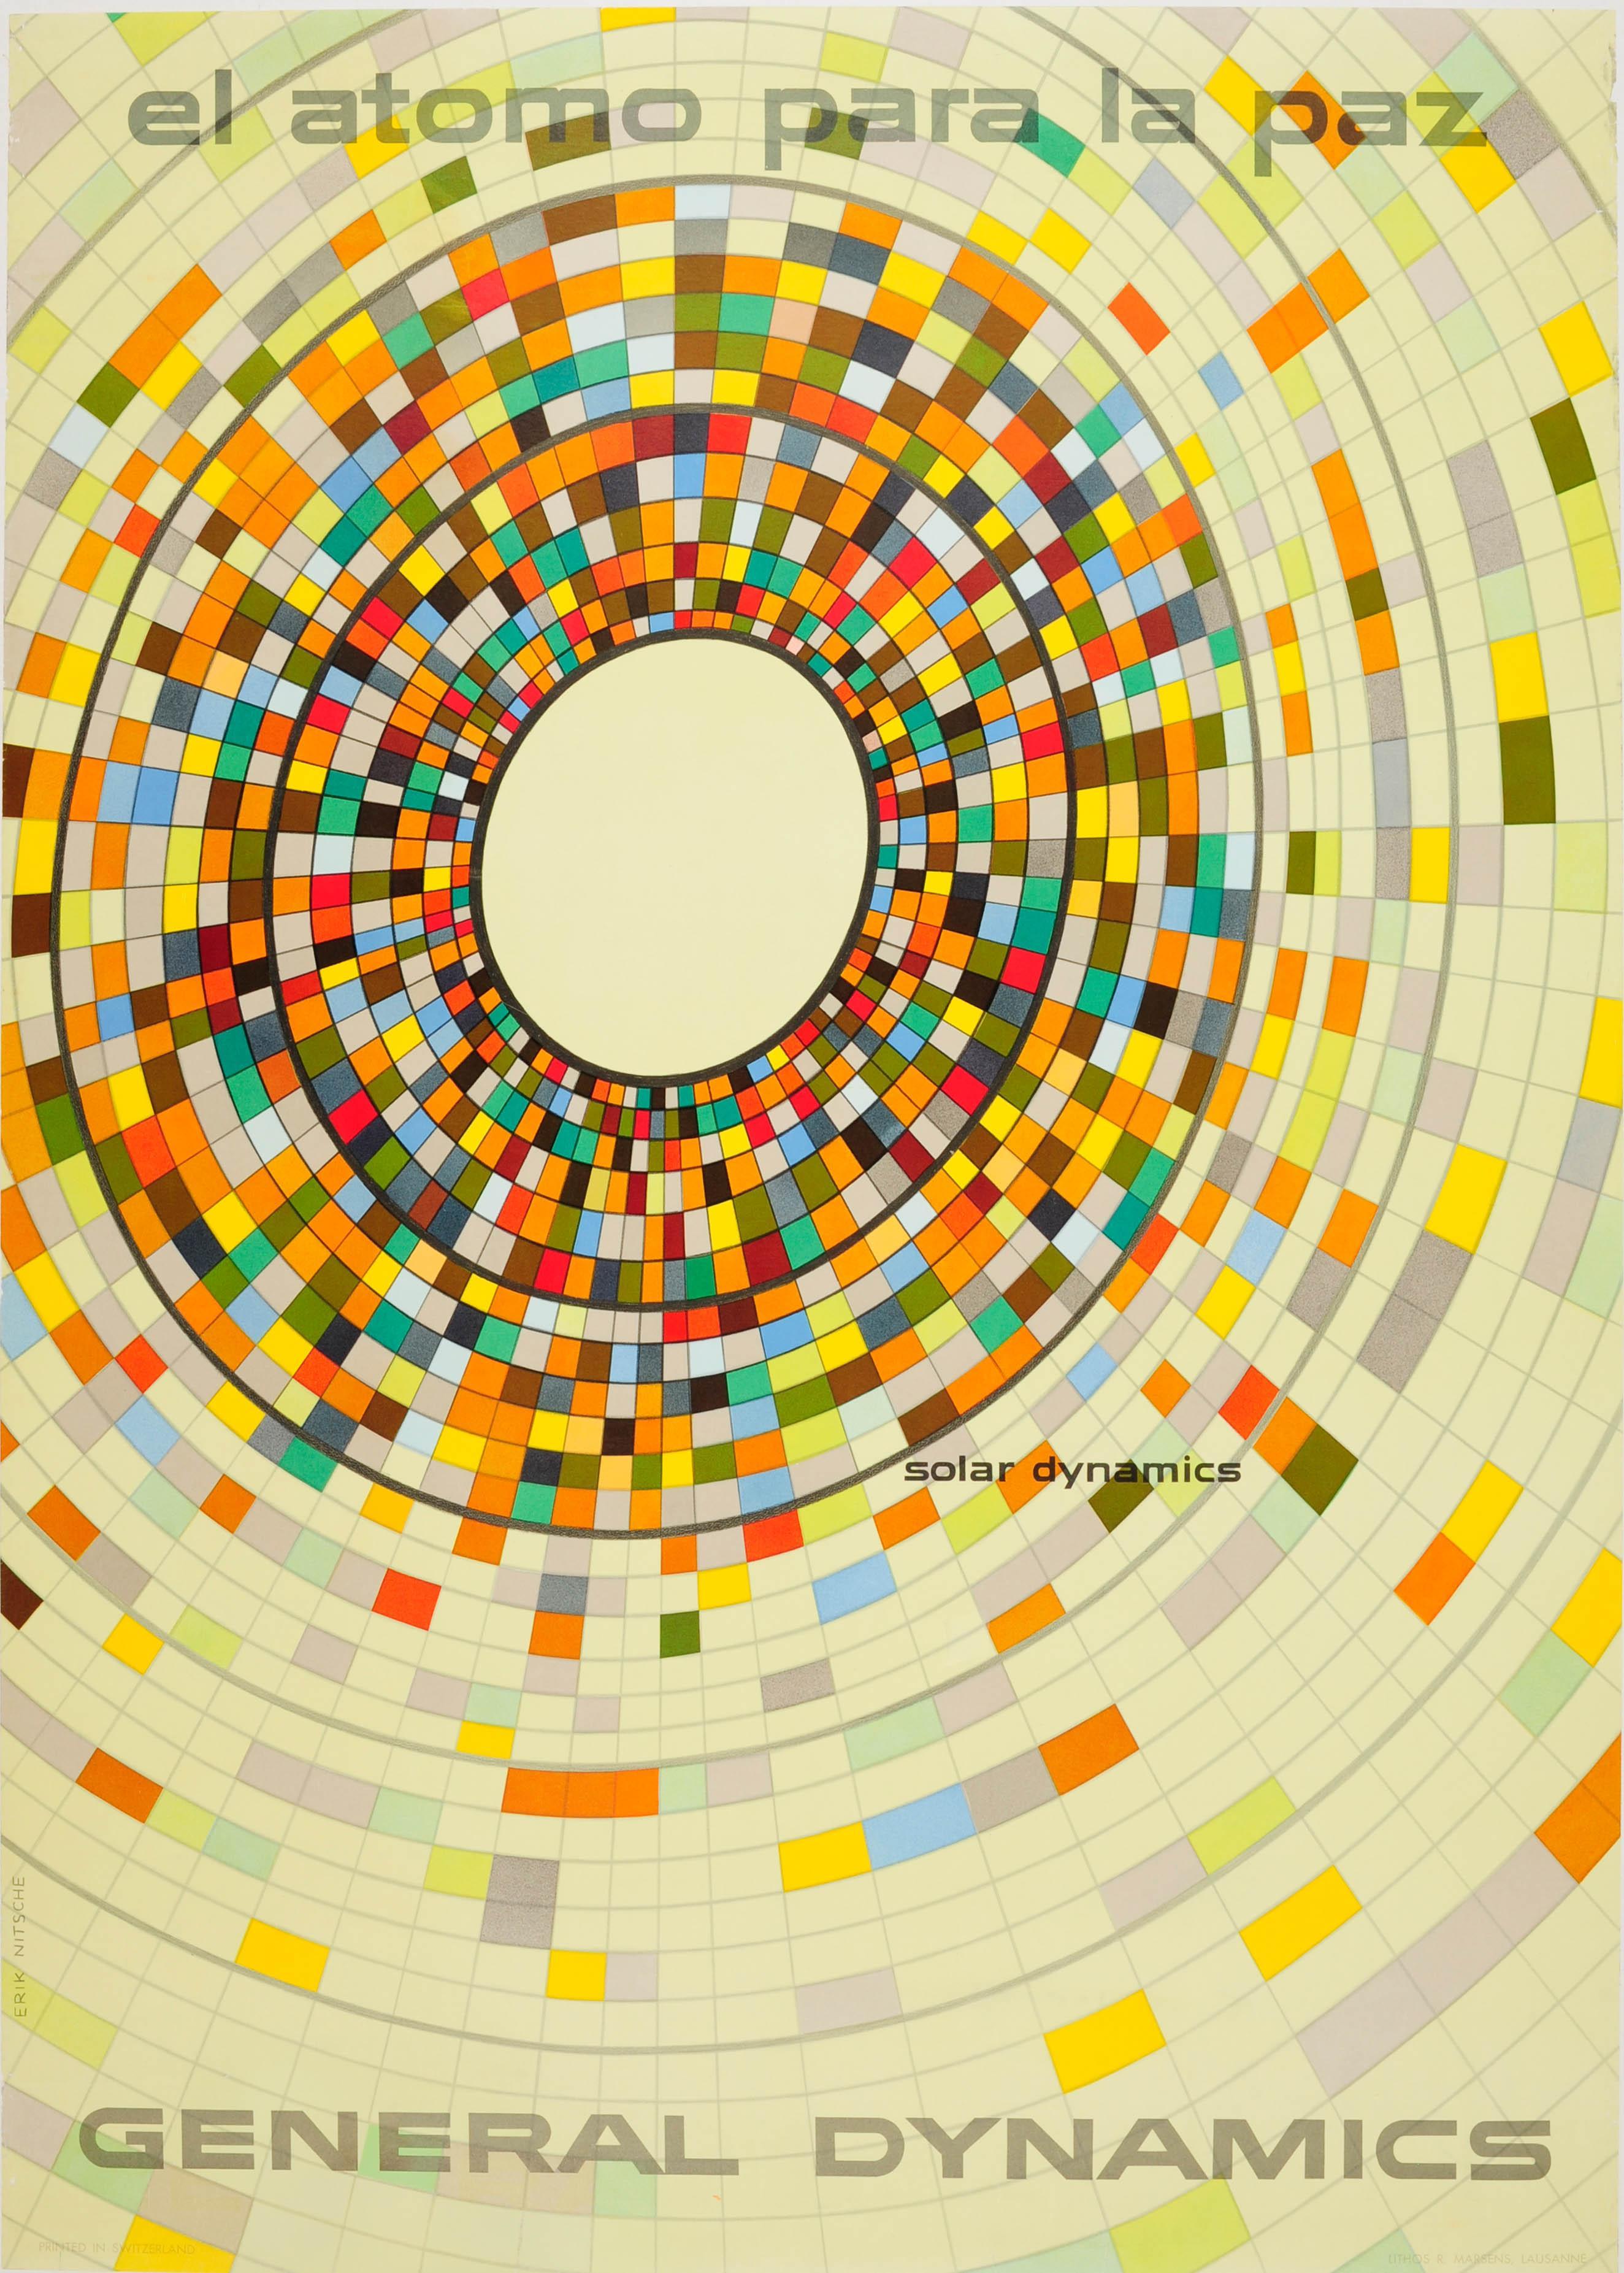 Original Vintage General Dynamics Poster Solar Dynamics Atoms For Peace Nitsche